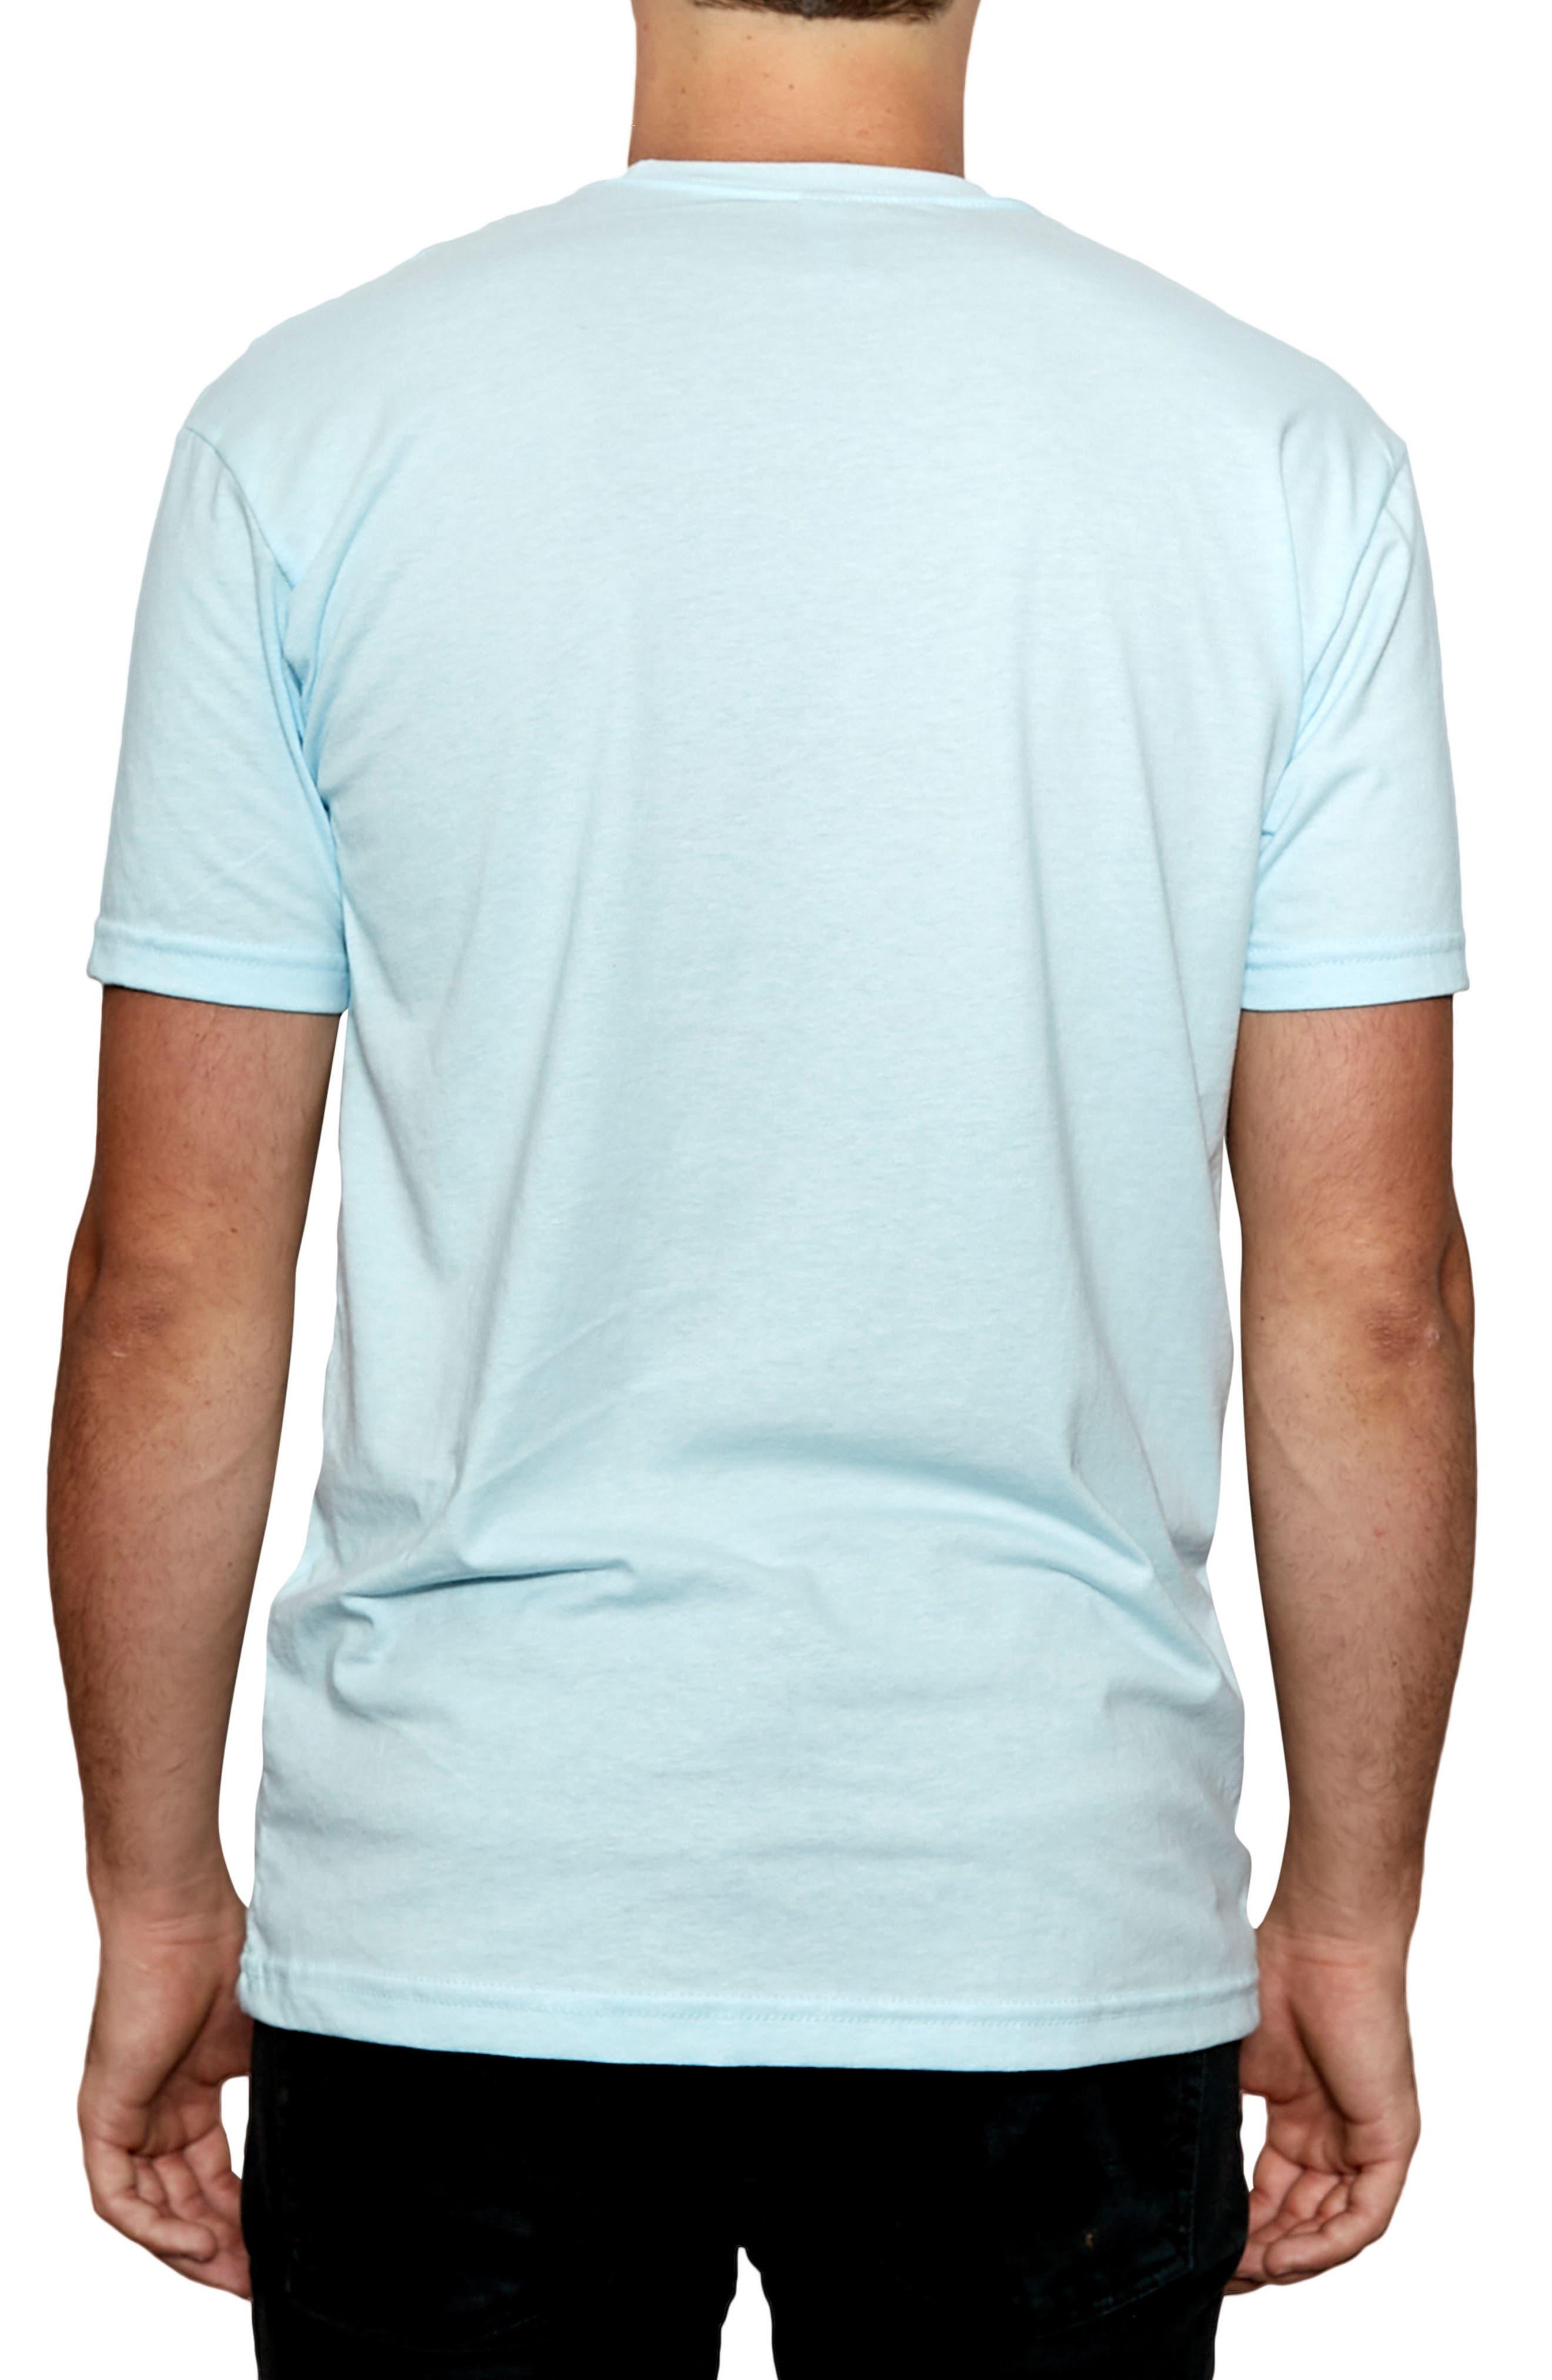 Check Please Graphic T-Shirt,                             Alternate thumbnail 2, color,                             Light Blue